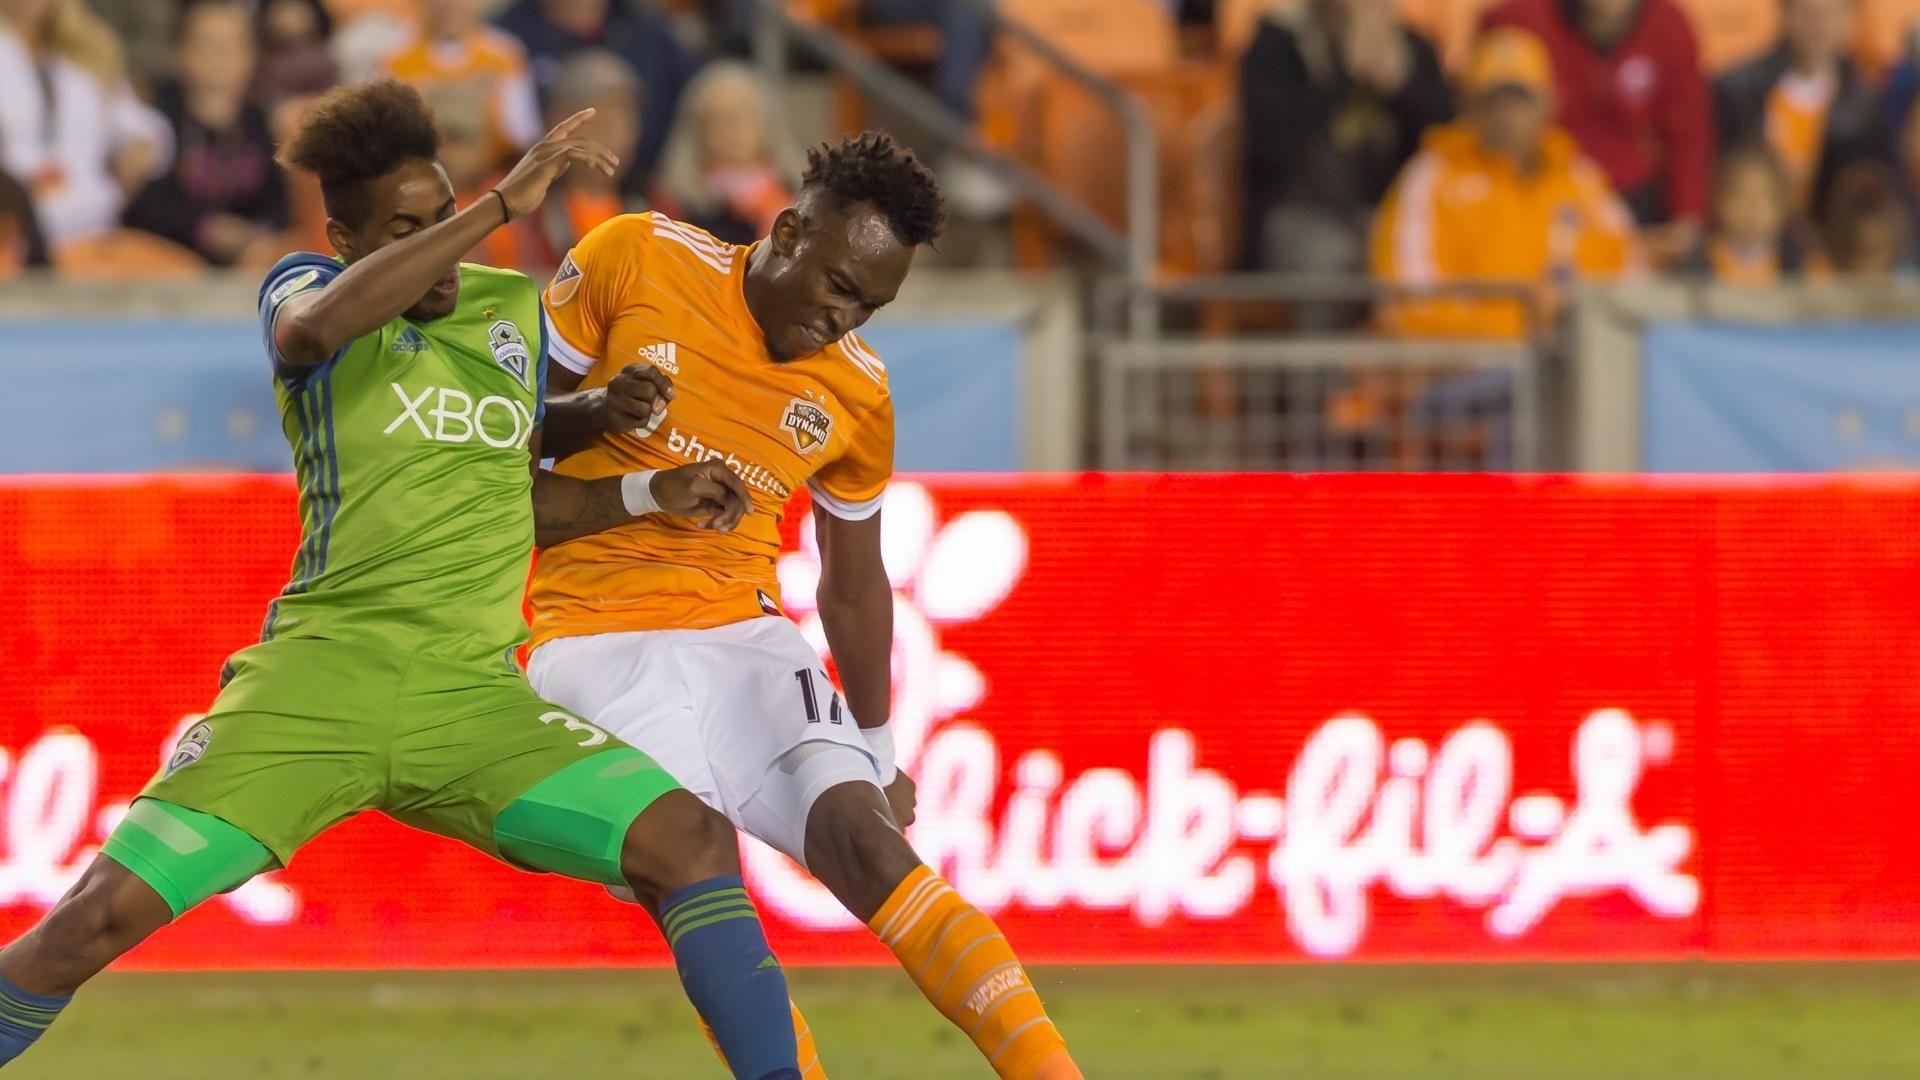 Video via MLS: Dynamo 2-1 Sounders